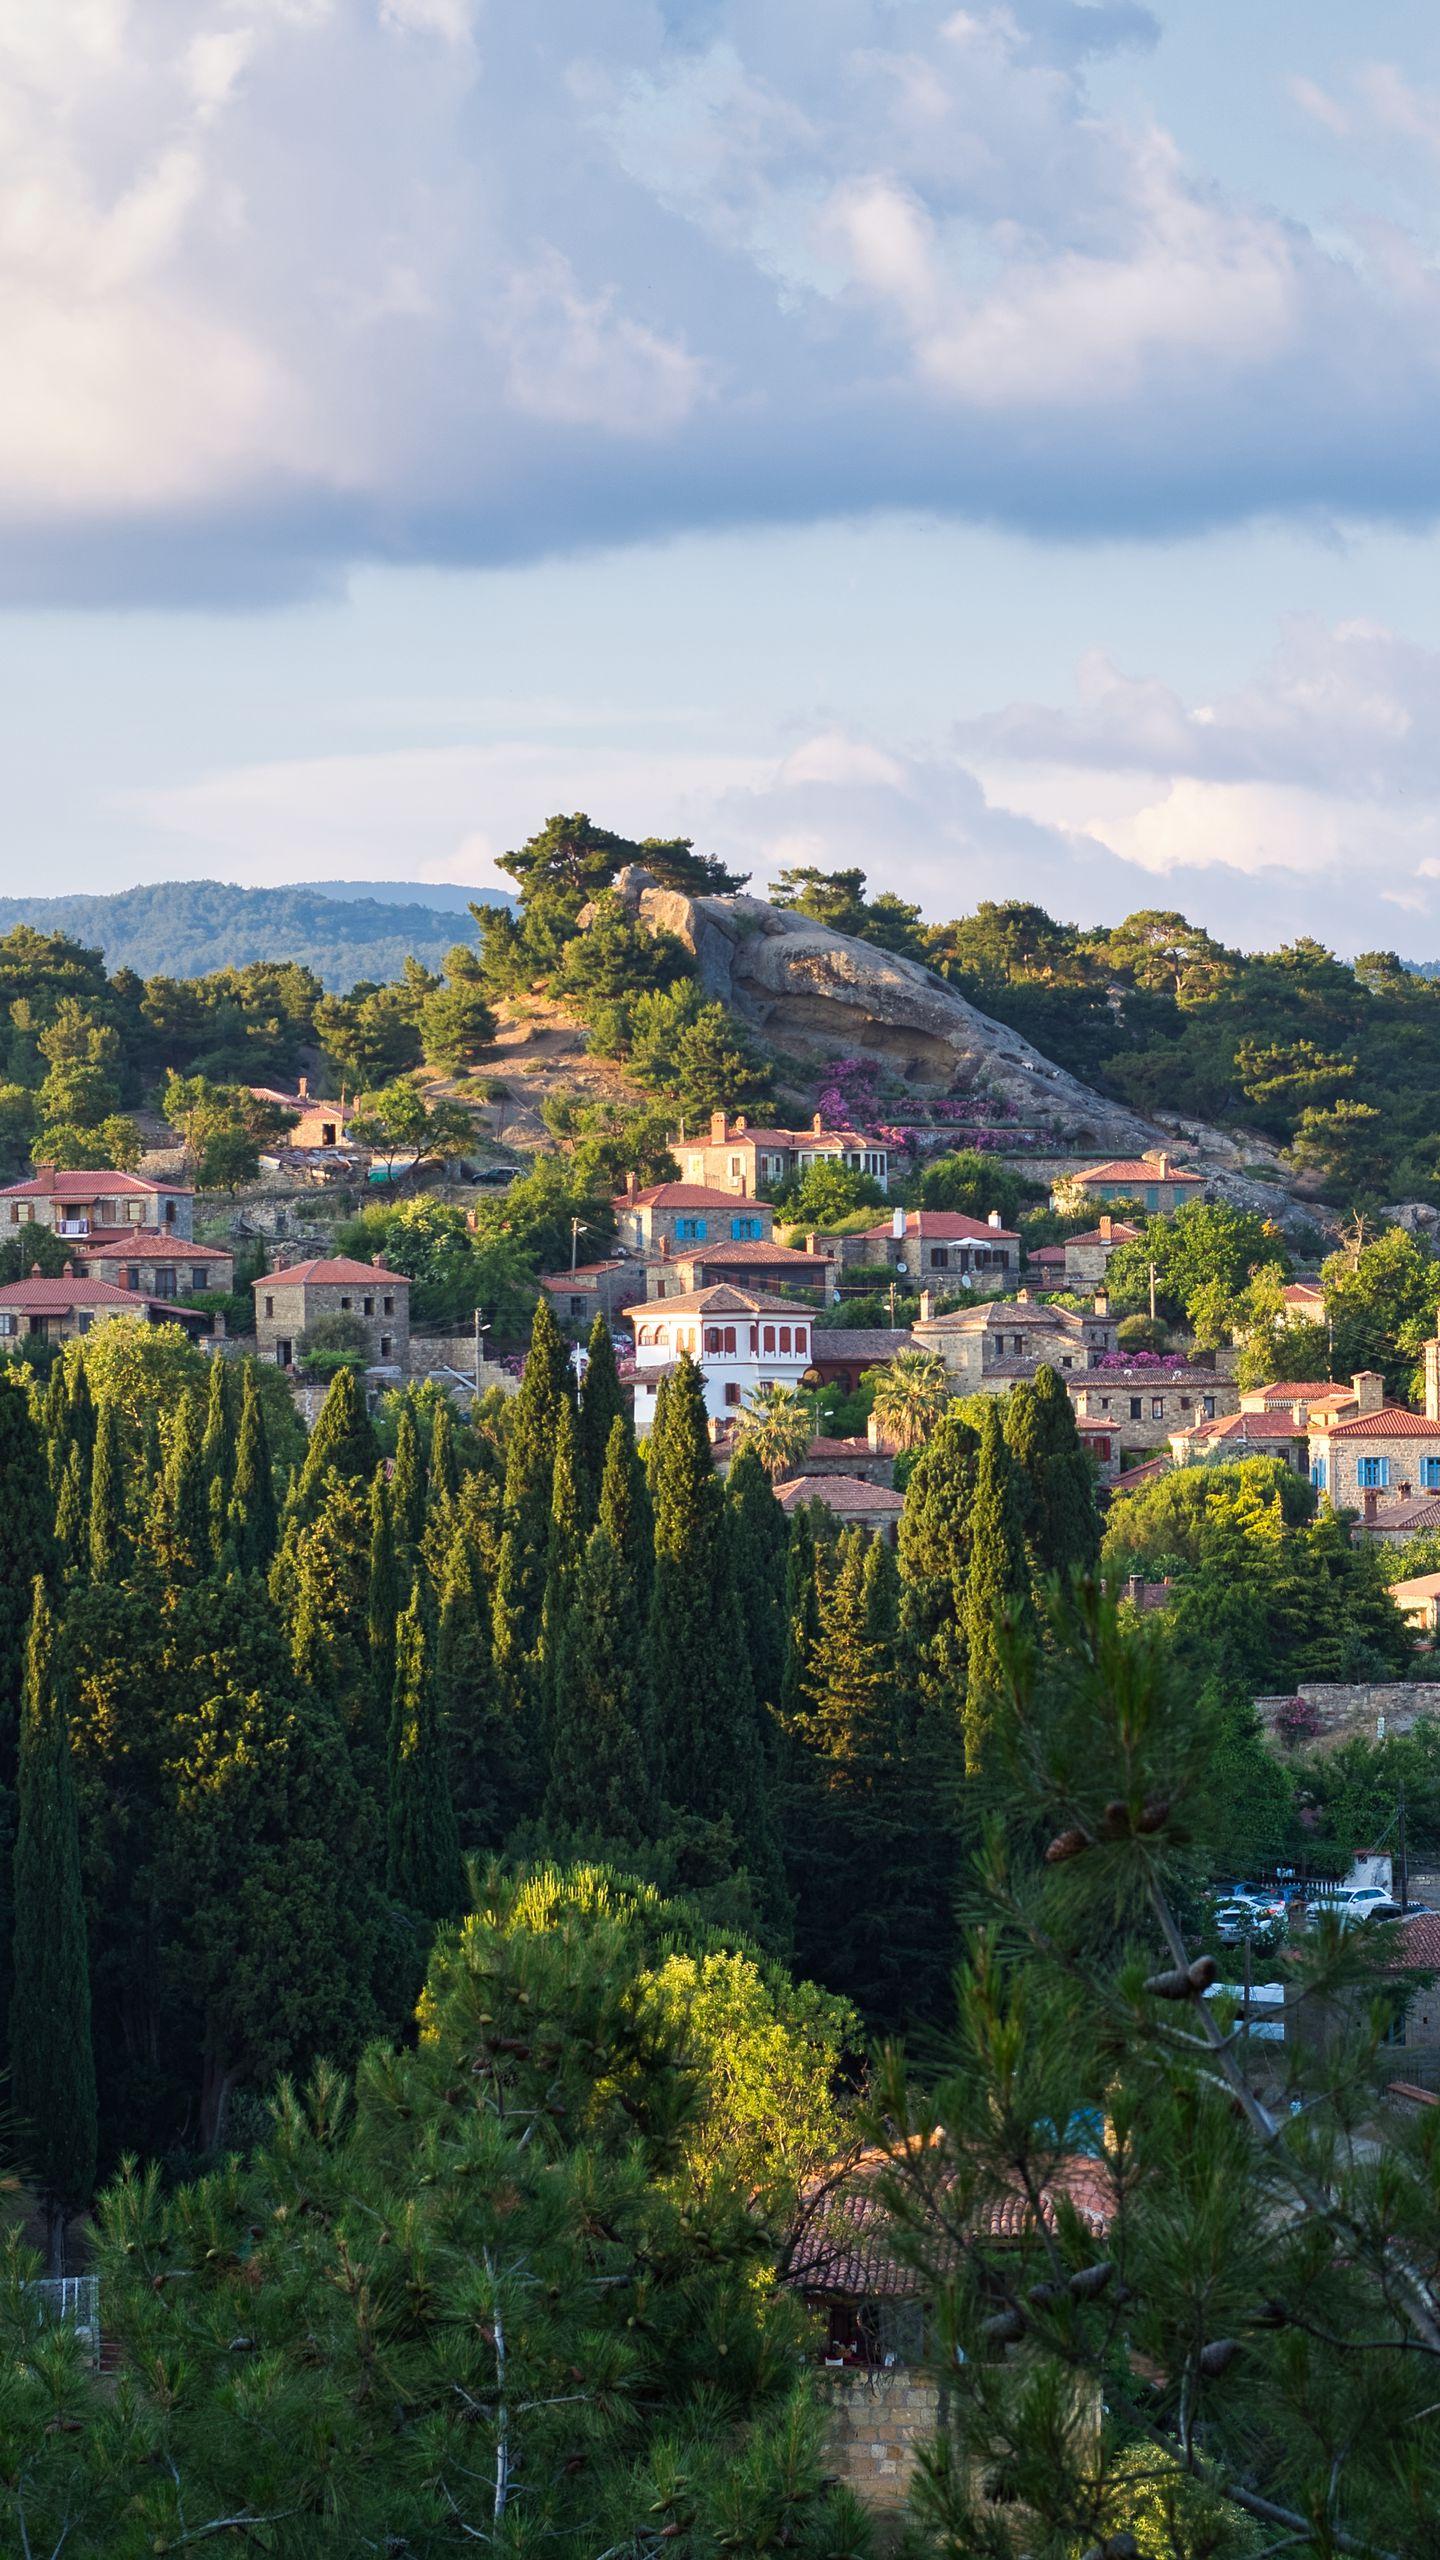 1440x2560 Wallpaper village, mountain, buildings, trees